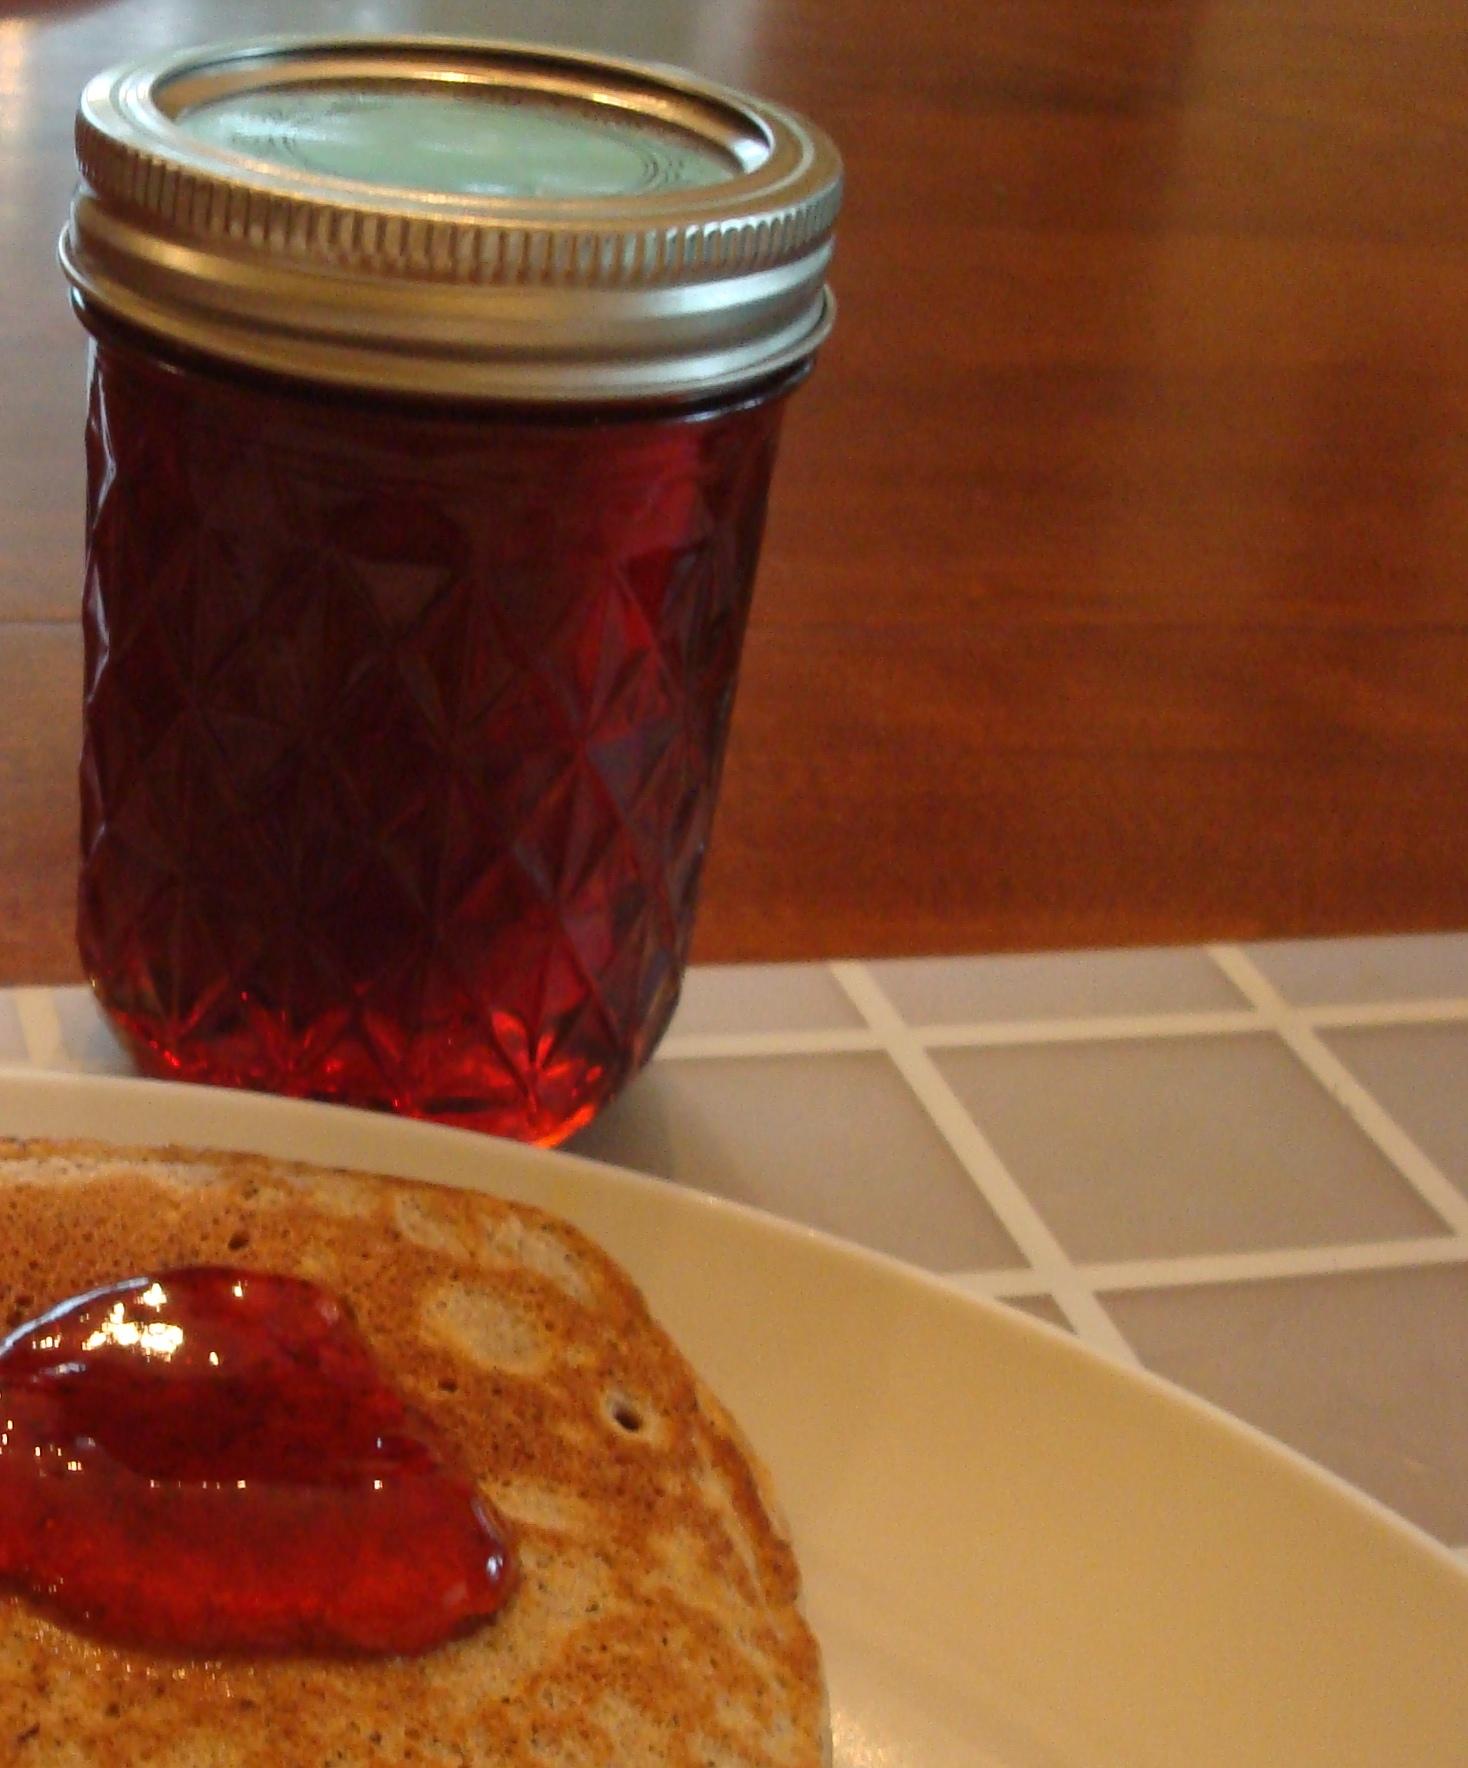 crab apple jelly - Apple Jelly Recipes